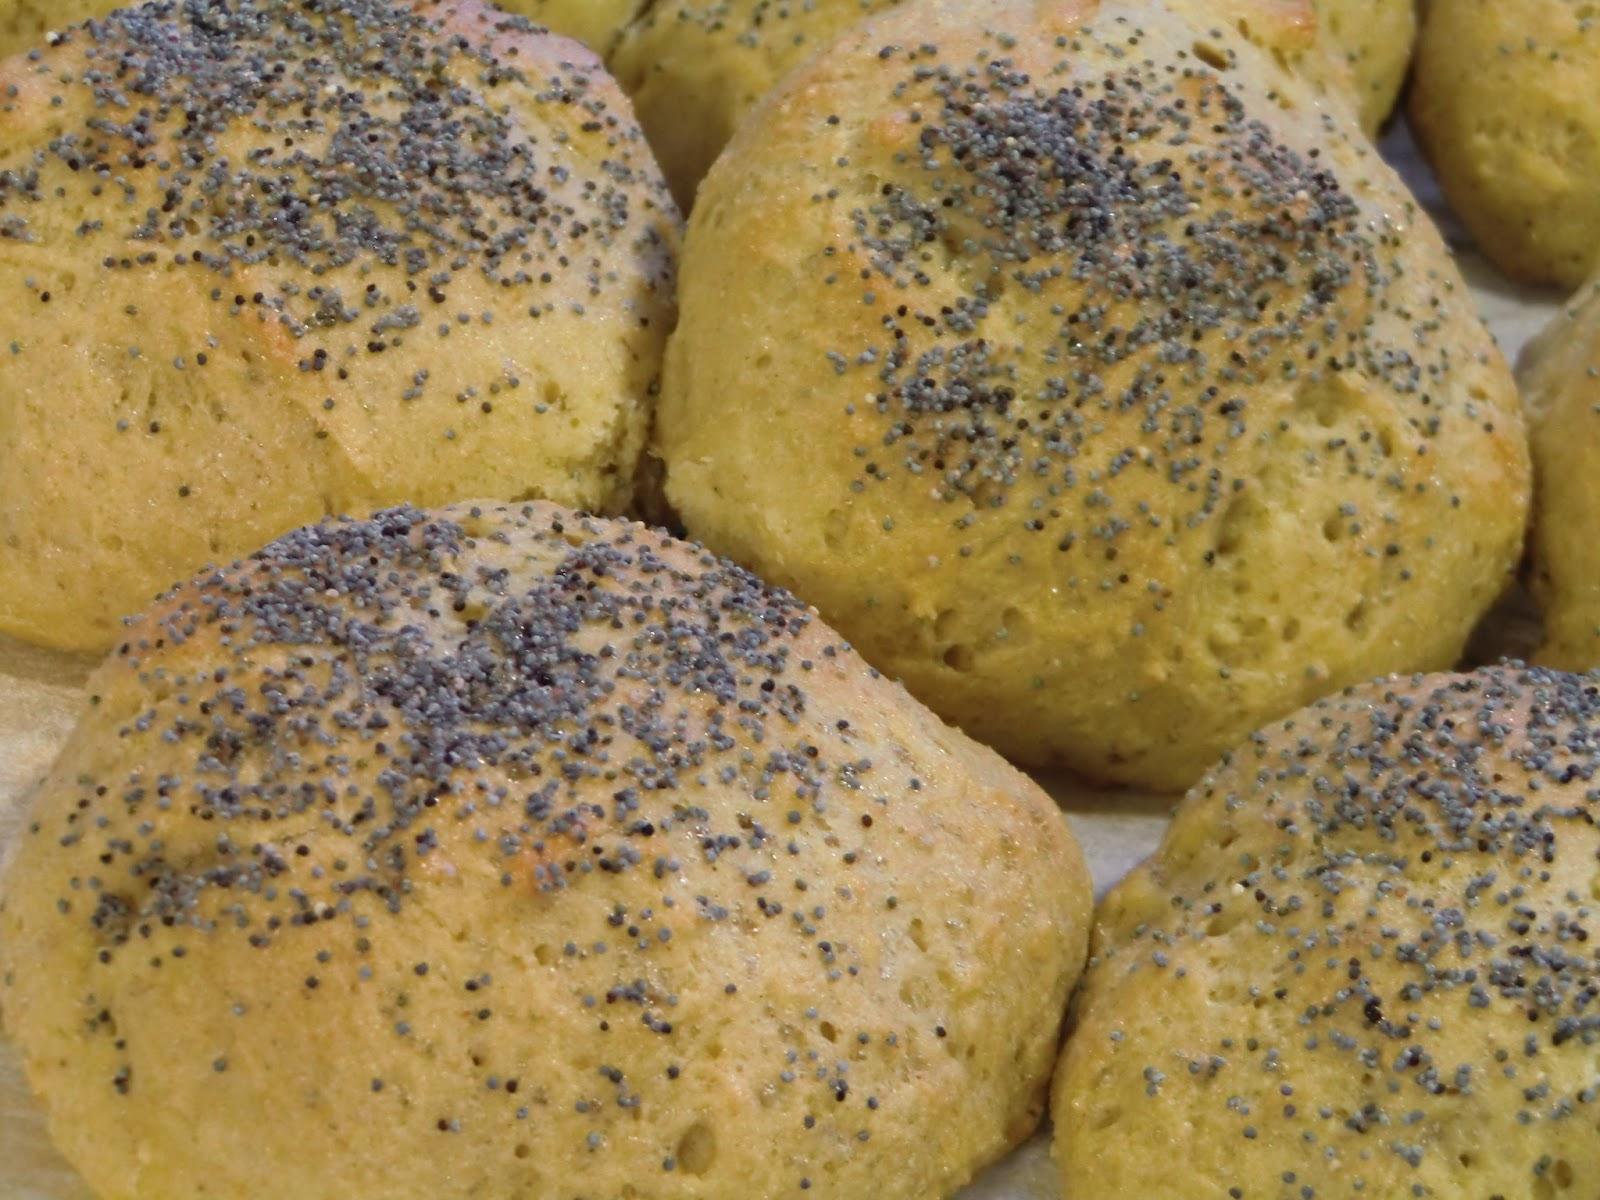 kikärtsmjöl bröd recept